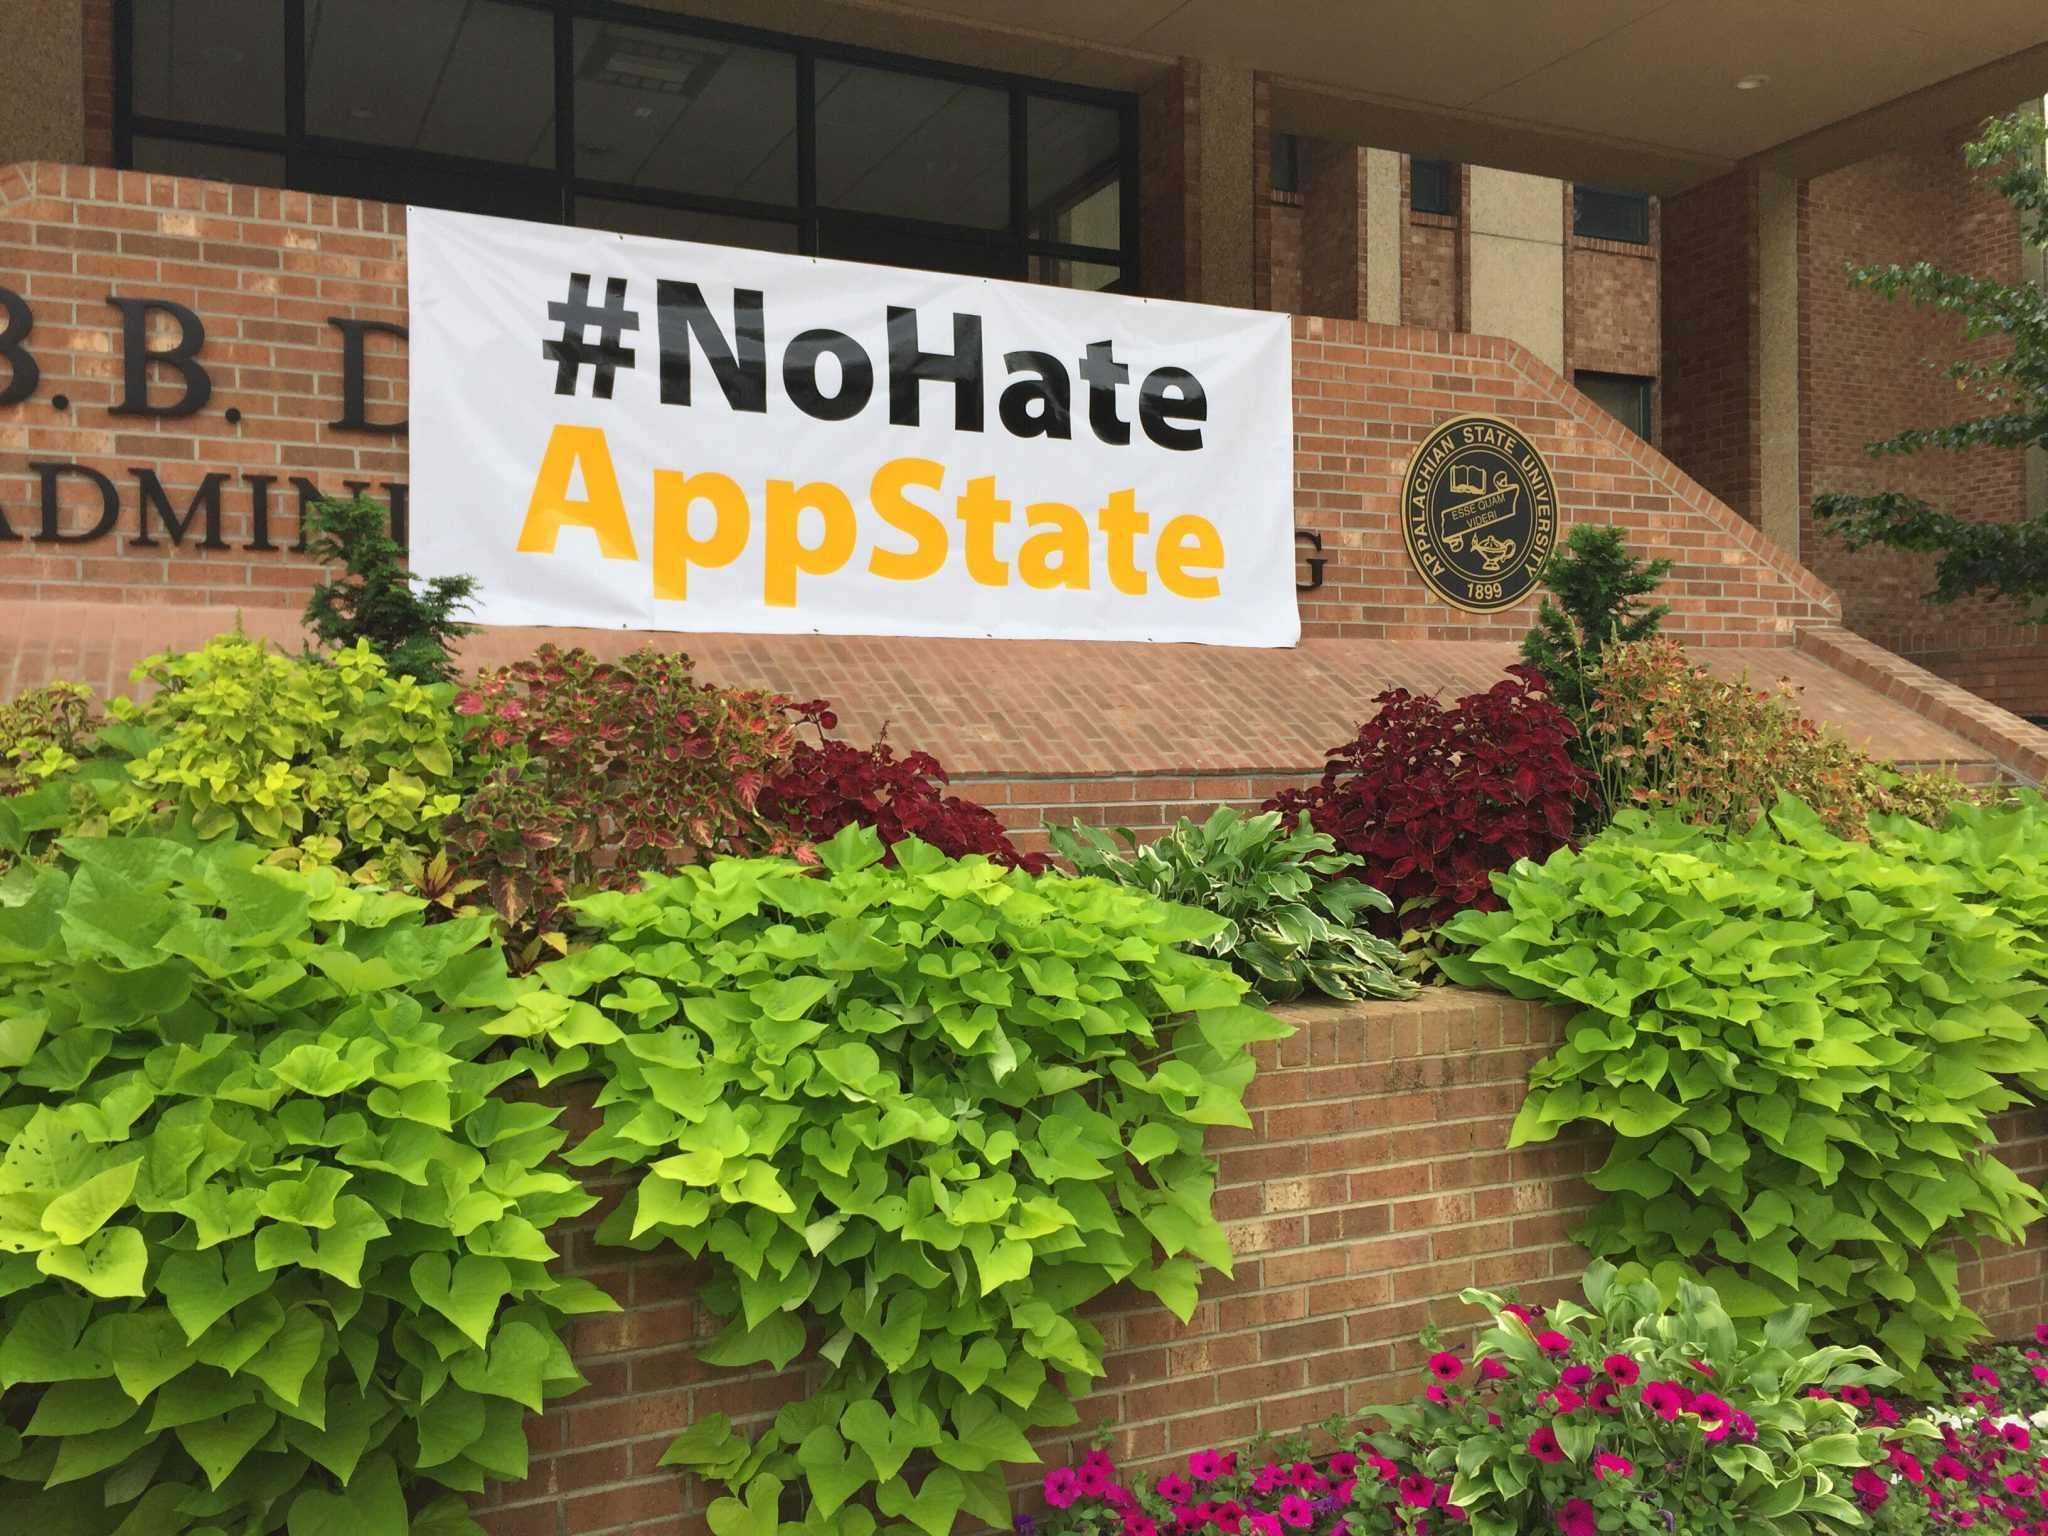 Hate+erasure+at+App+puts+students+at+risk